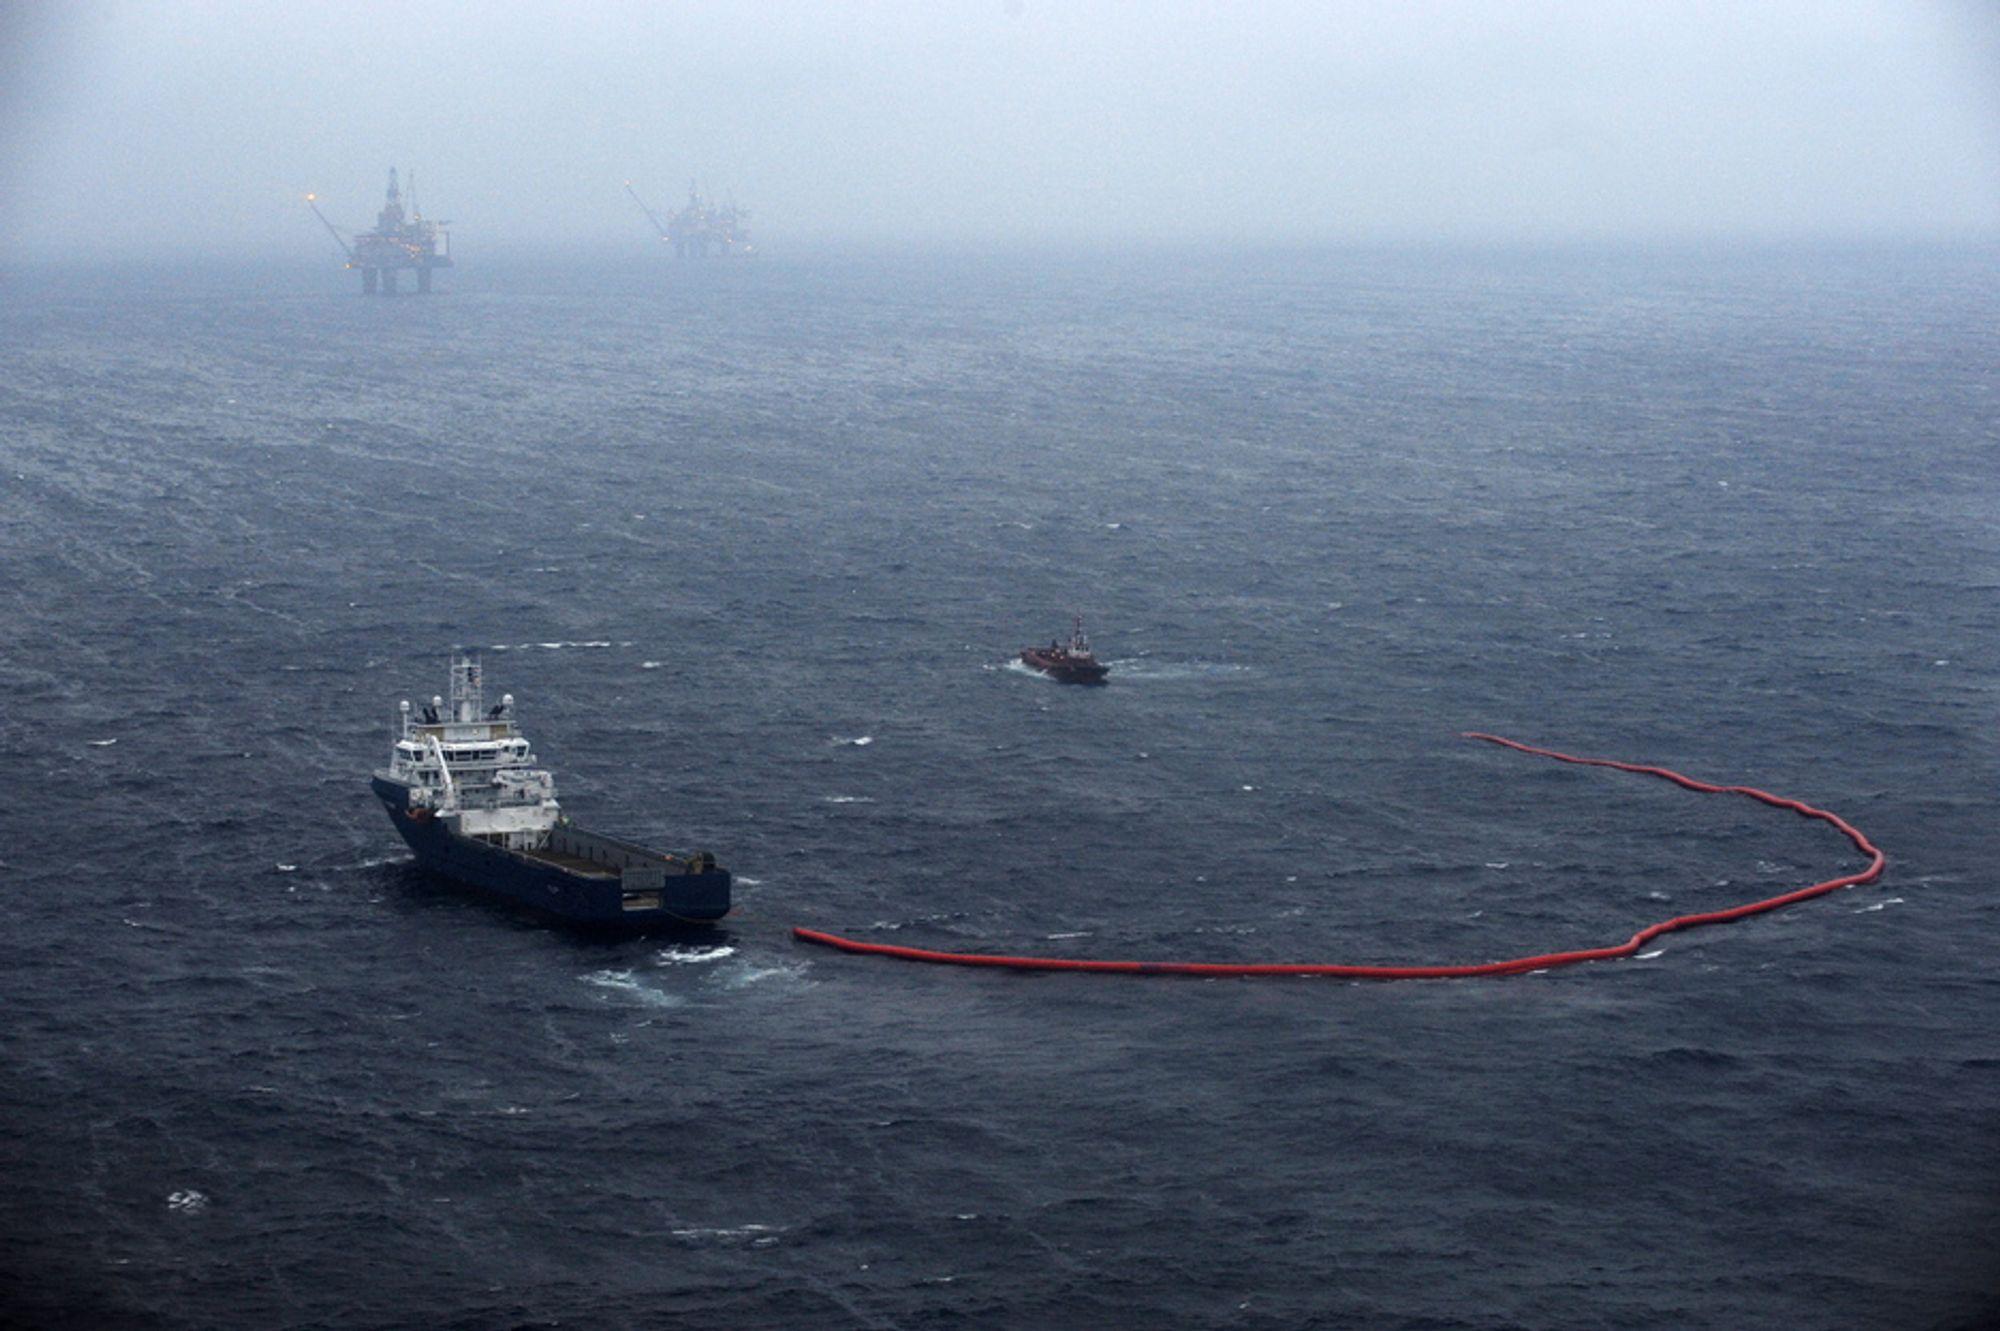 Ny forskning viser at oljeutslipp skader mer enn tidligere trodd.